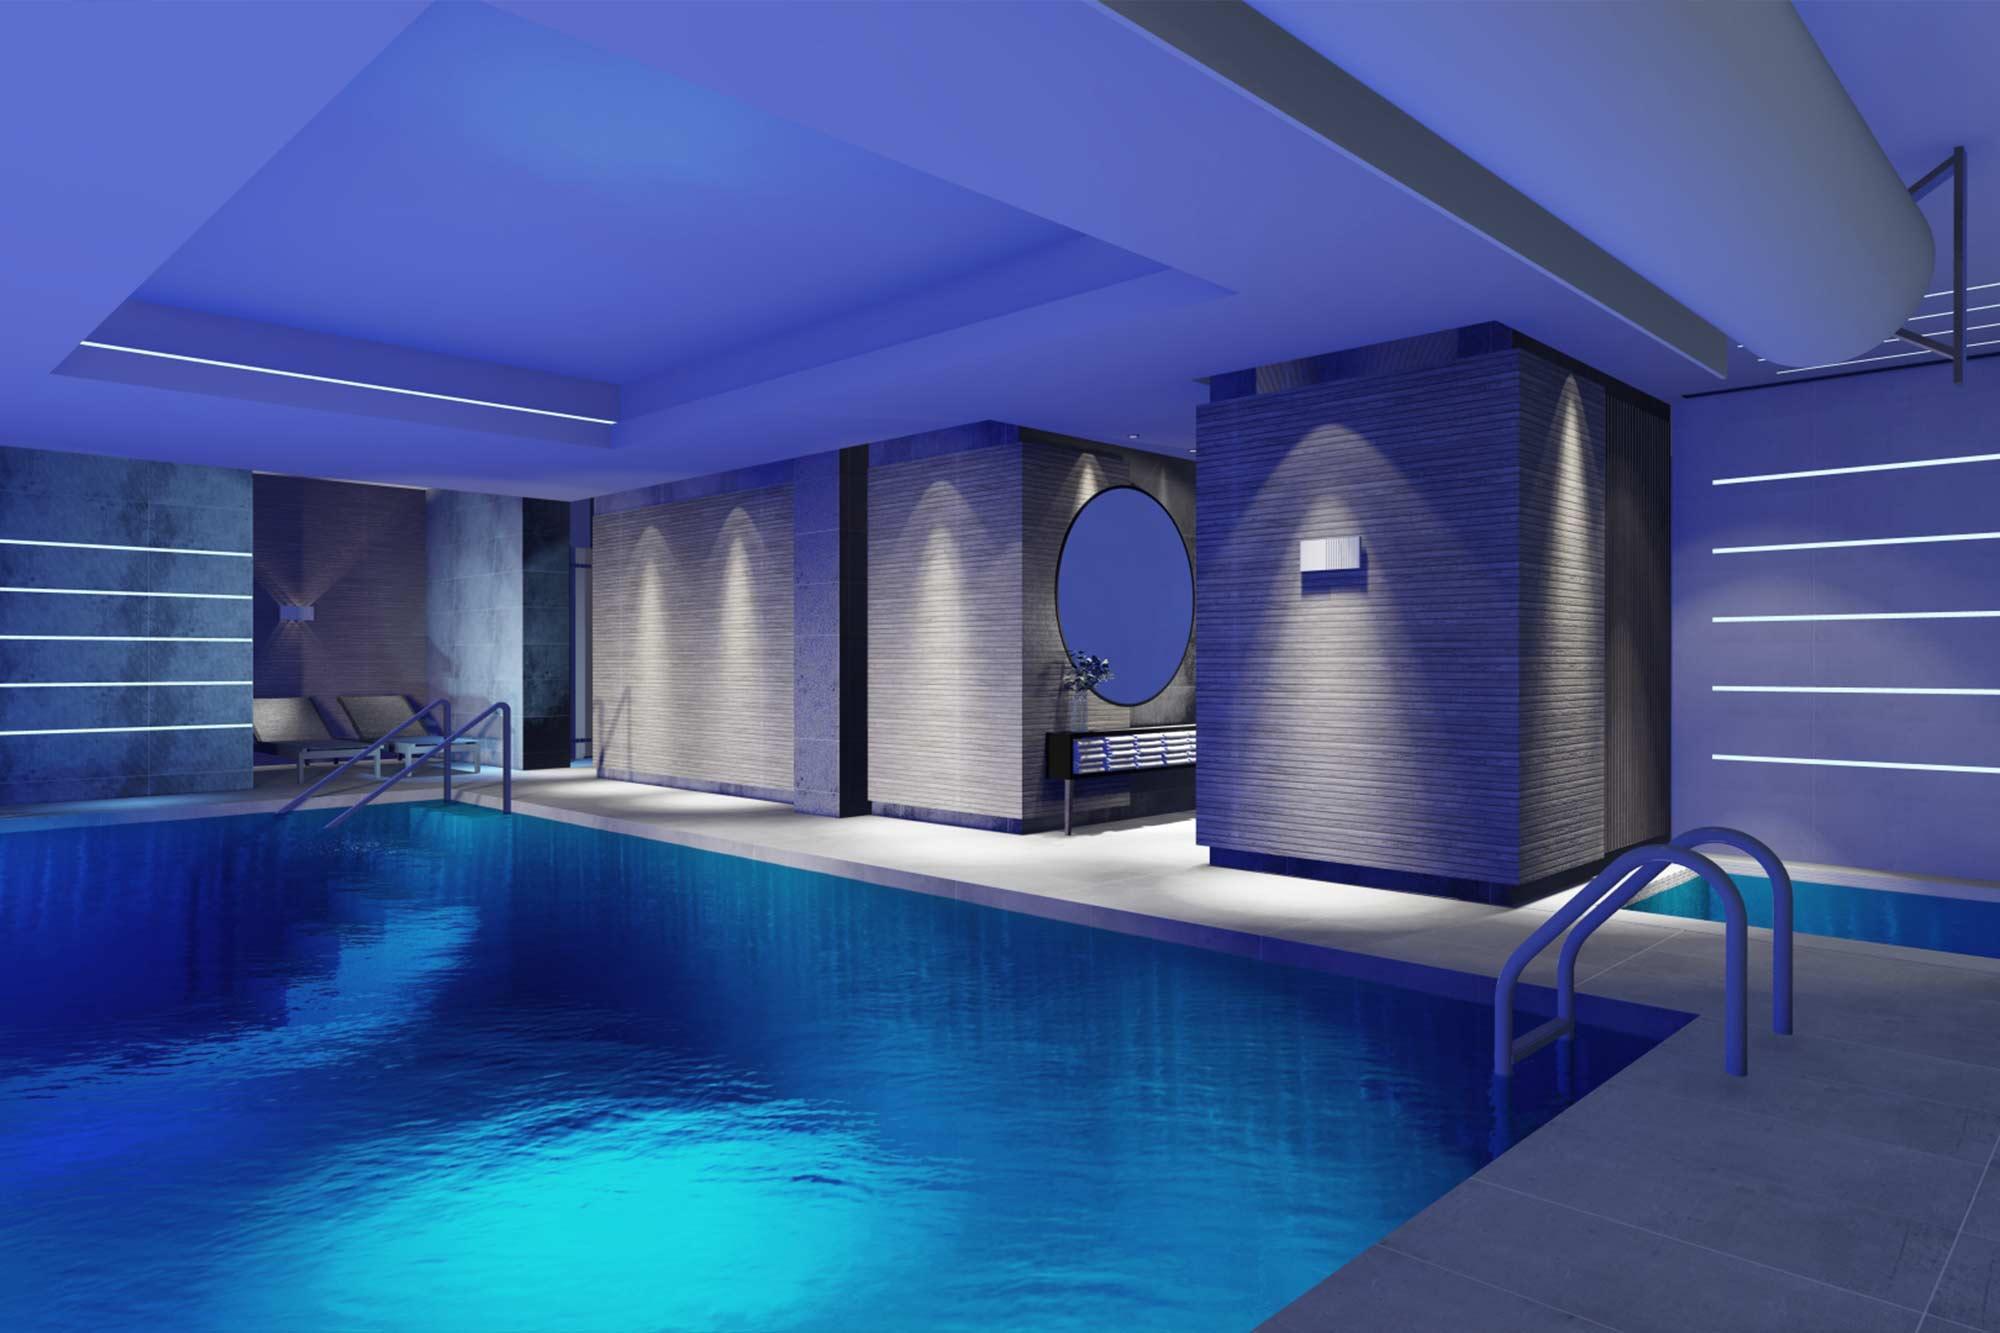 Blackpool Hotel Sheraton swimming pool and SPA extension architectural interior design